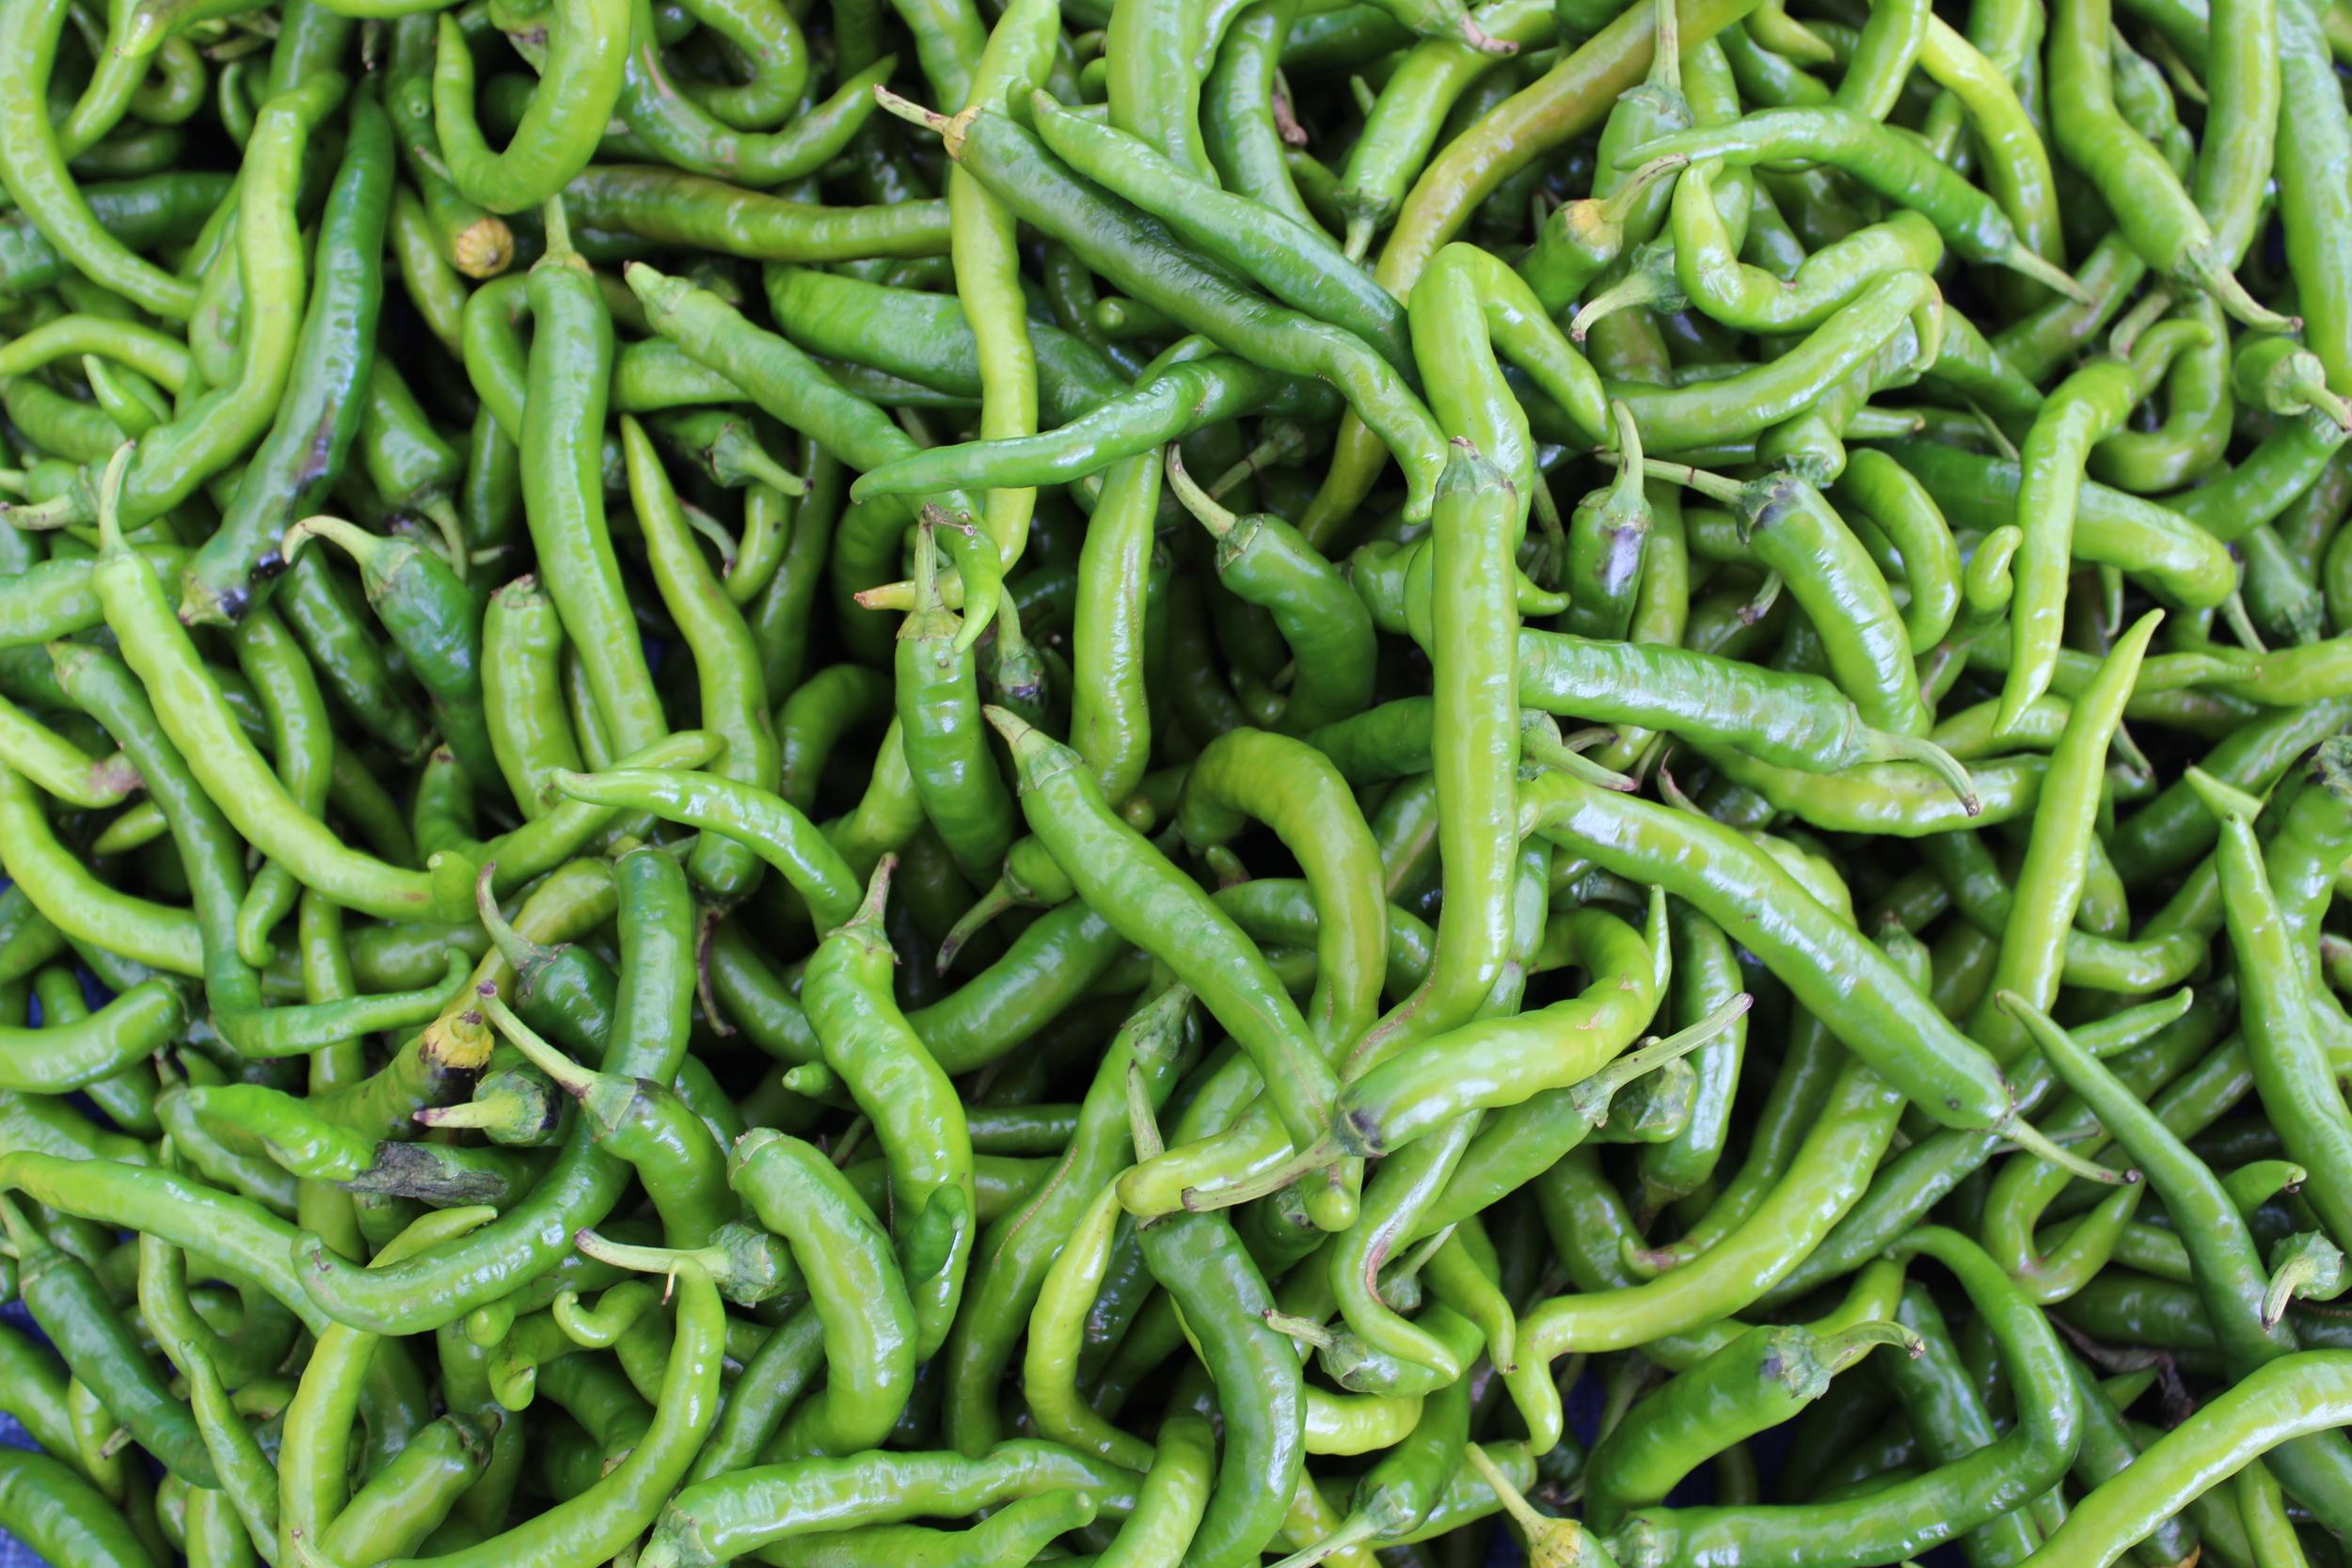 Green Chili